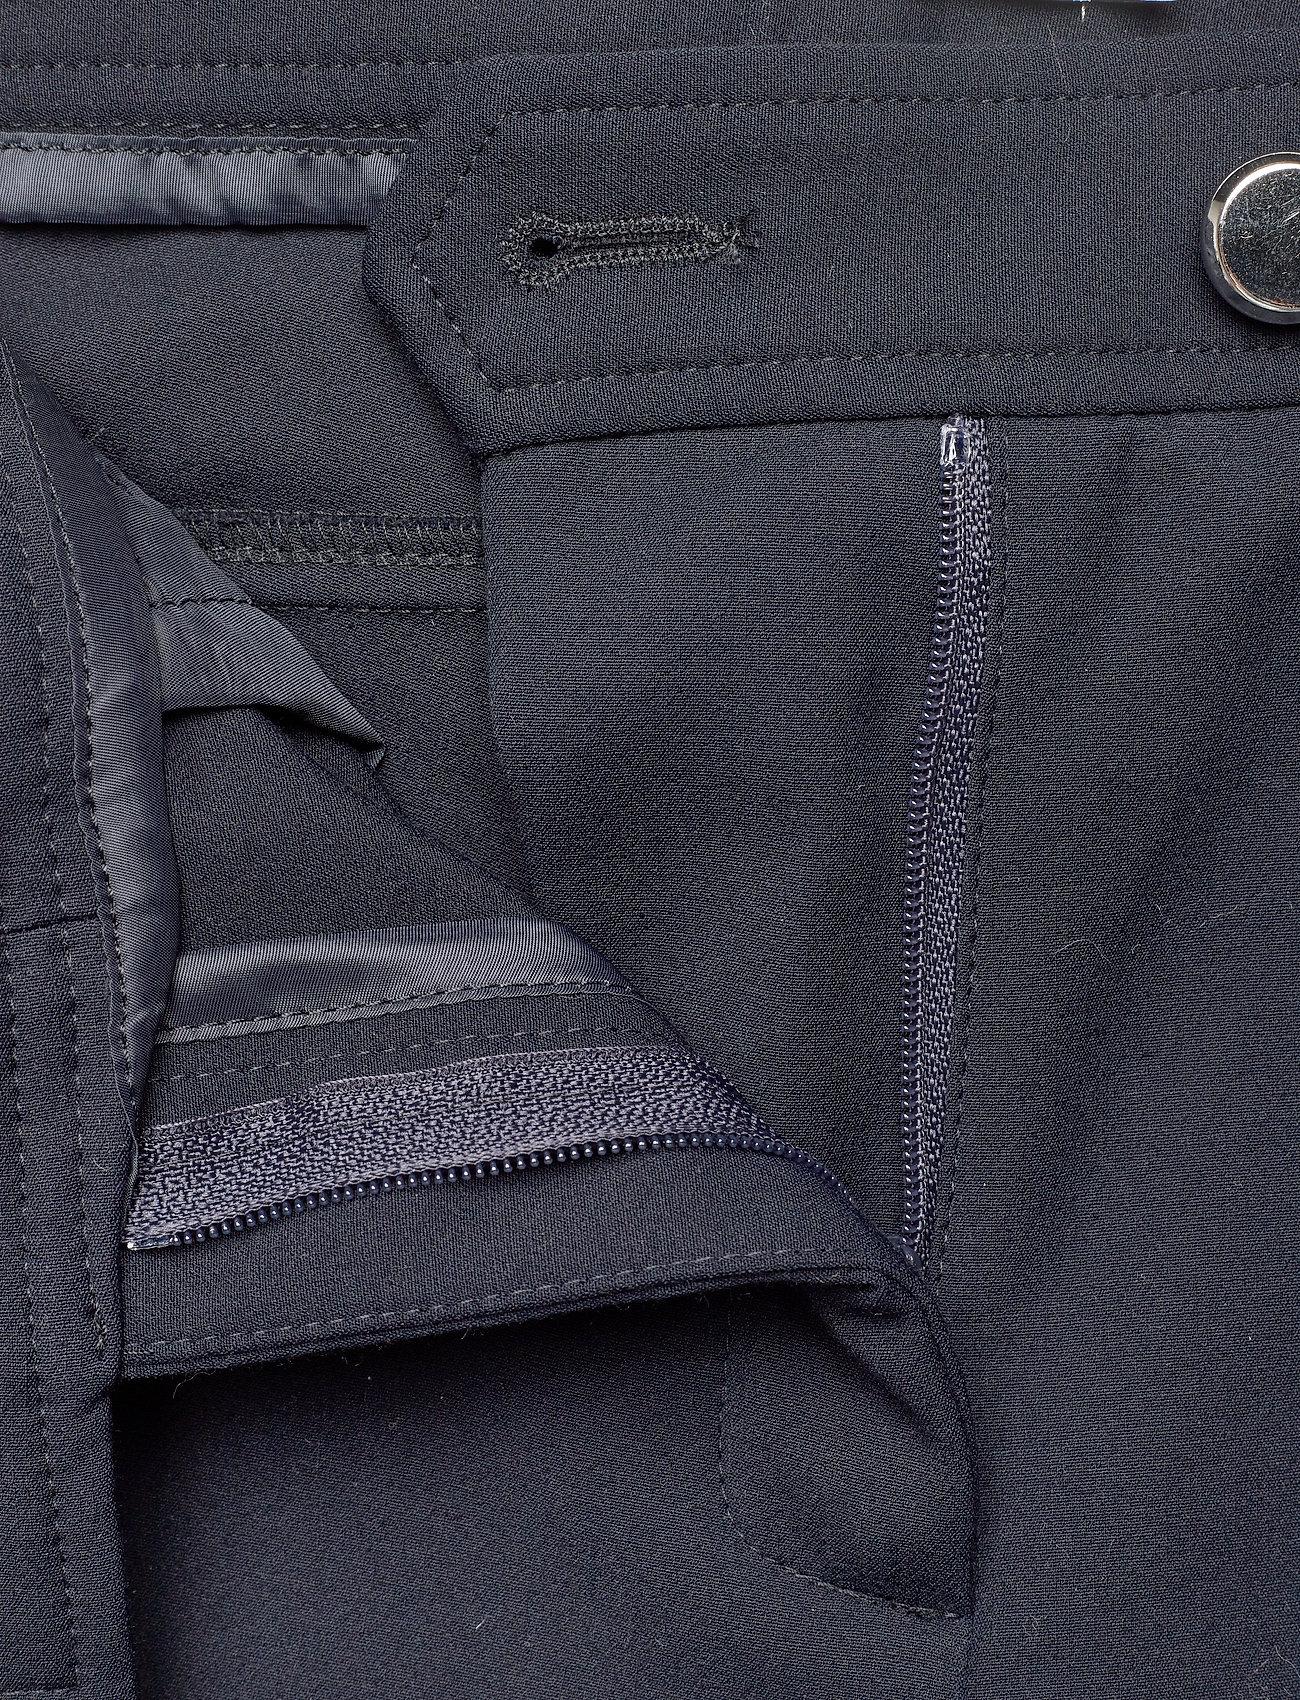 Tazia Trousers (Dark Navy) (114.50 €) - Andiata Ya8wK